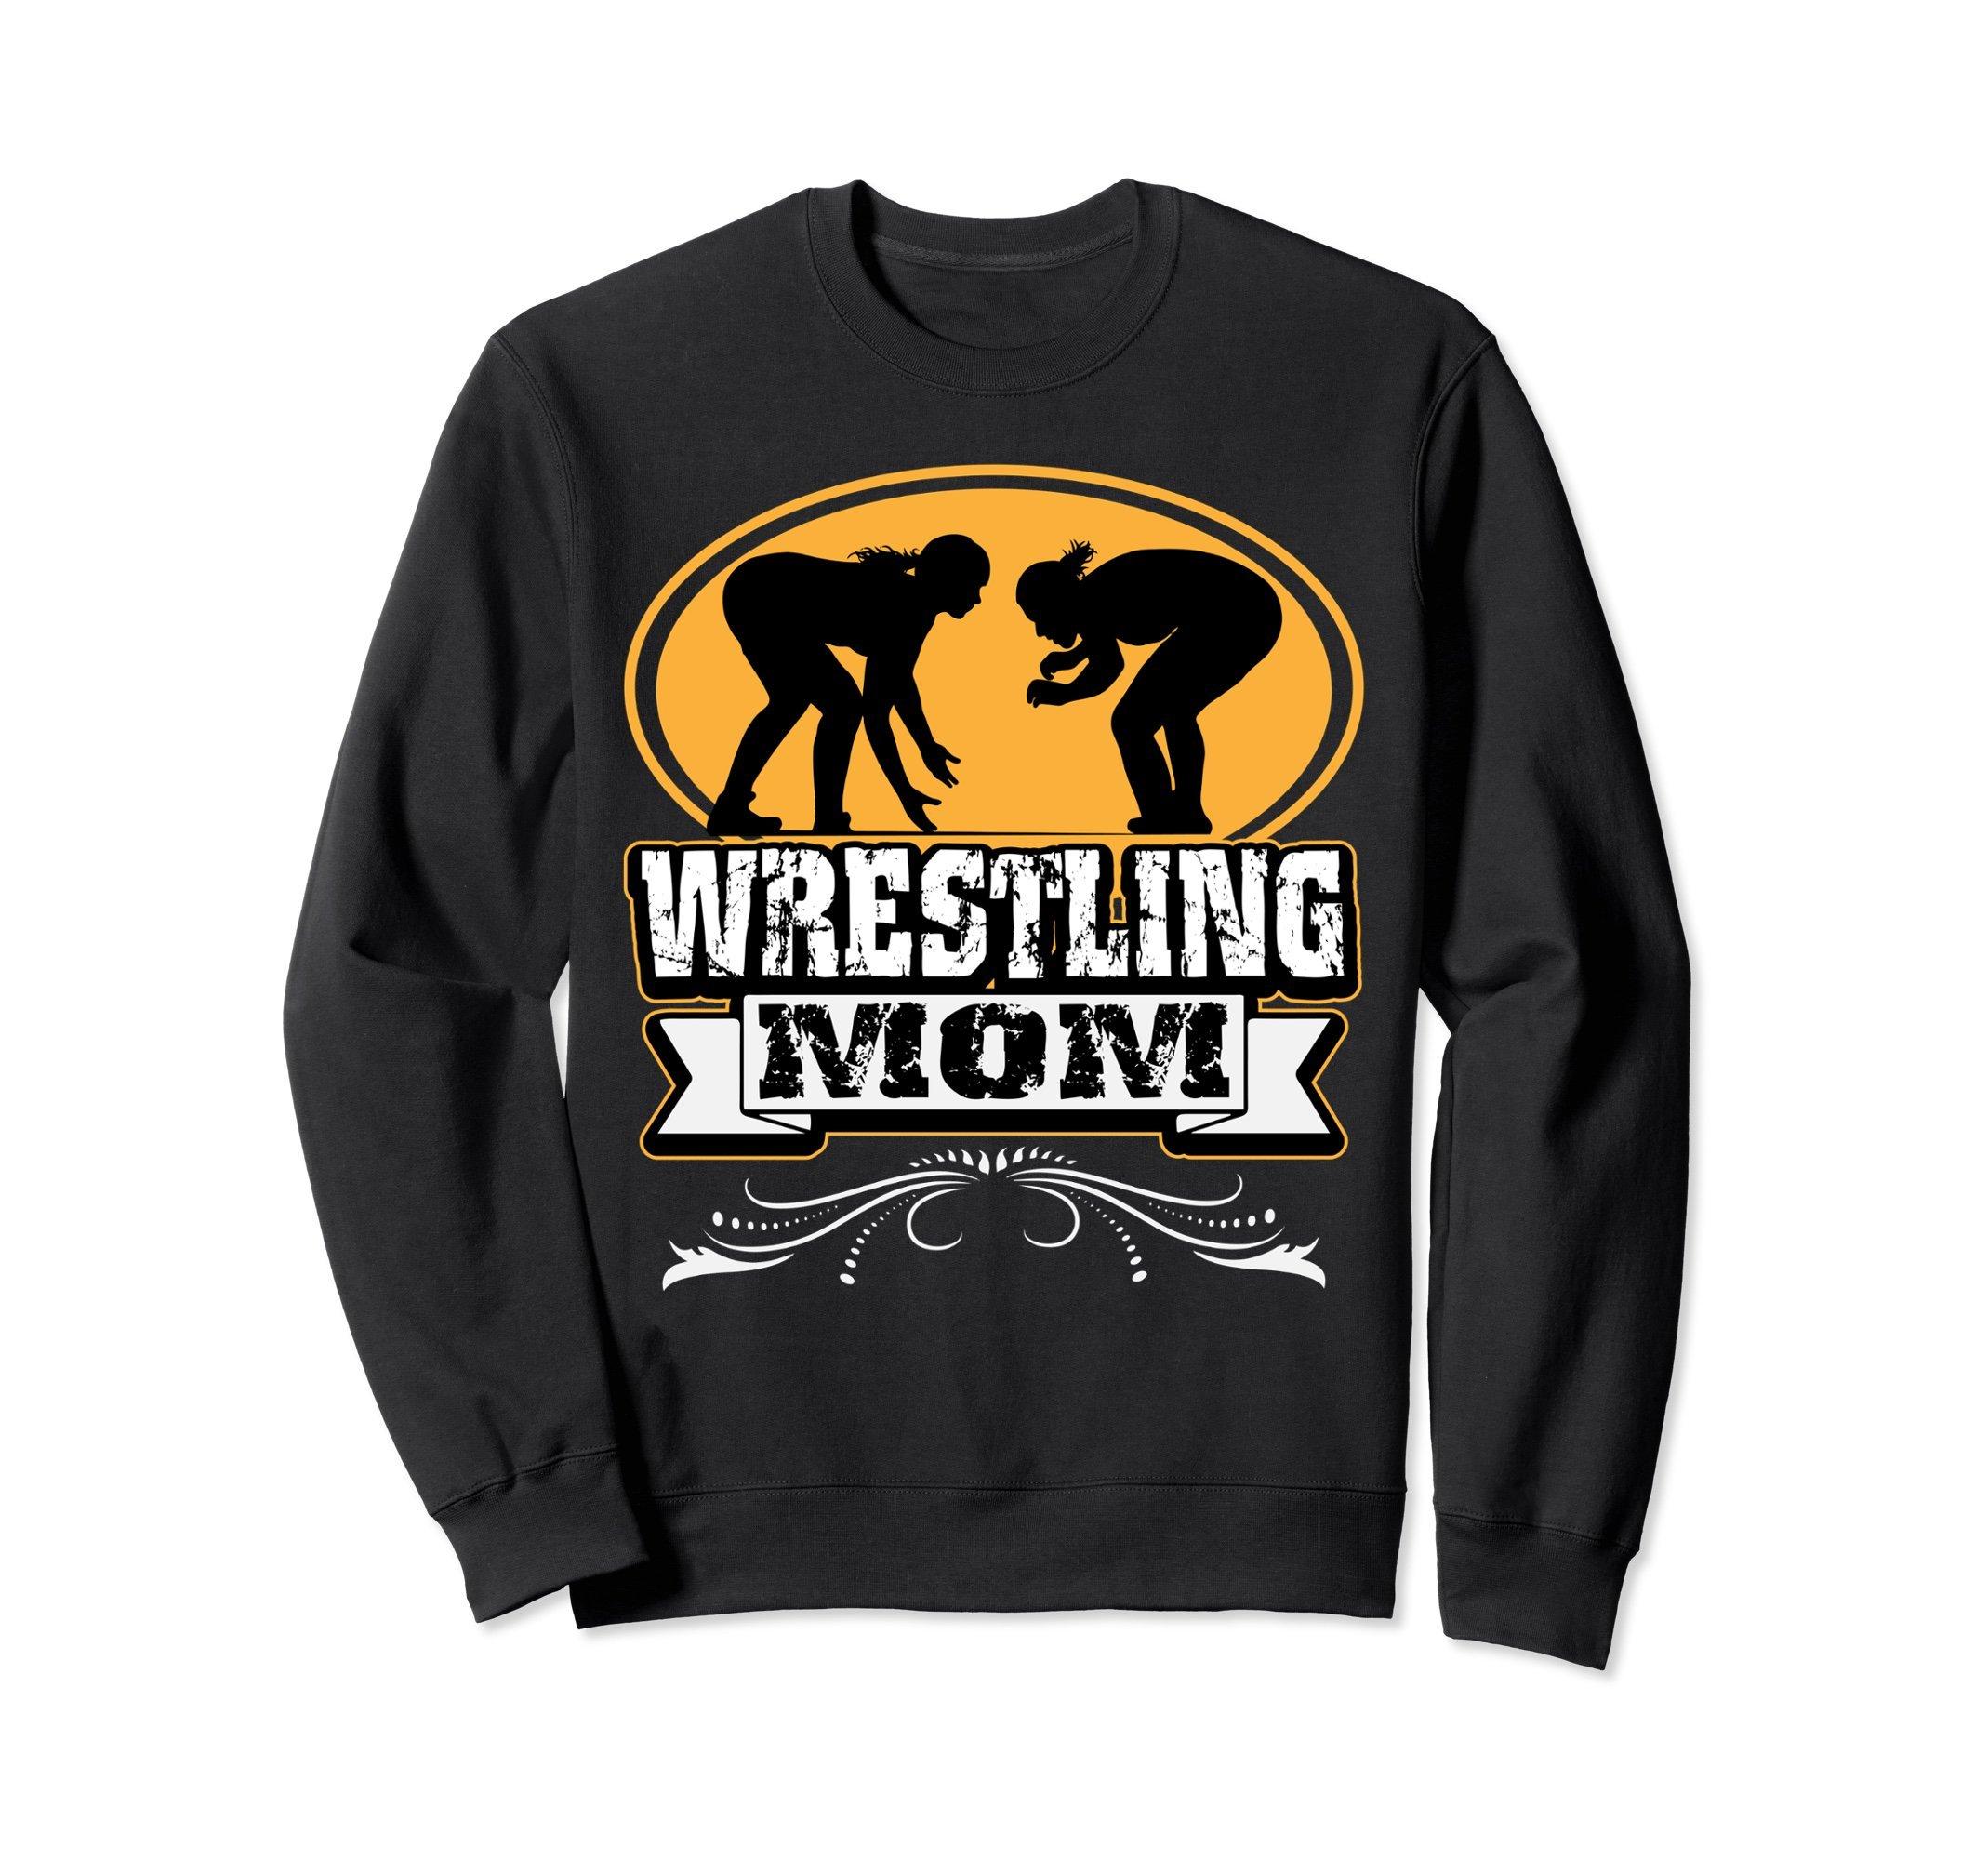 Unisex Wrestling Sweatshirt - Girls Wrestling Mom Sweater Medium Black by Wrestling Sweatshirt by Crush Retro